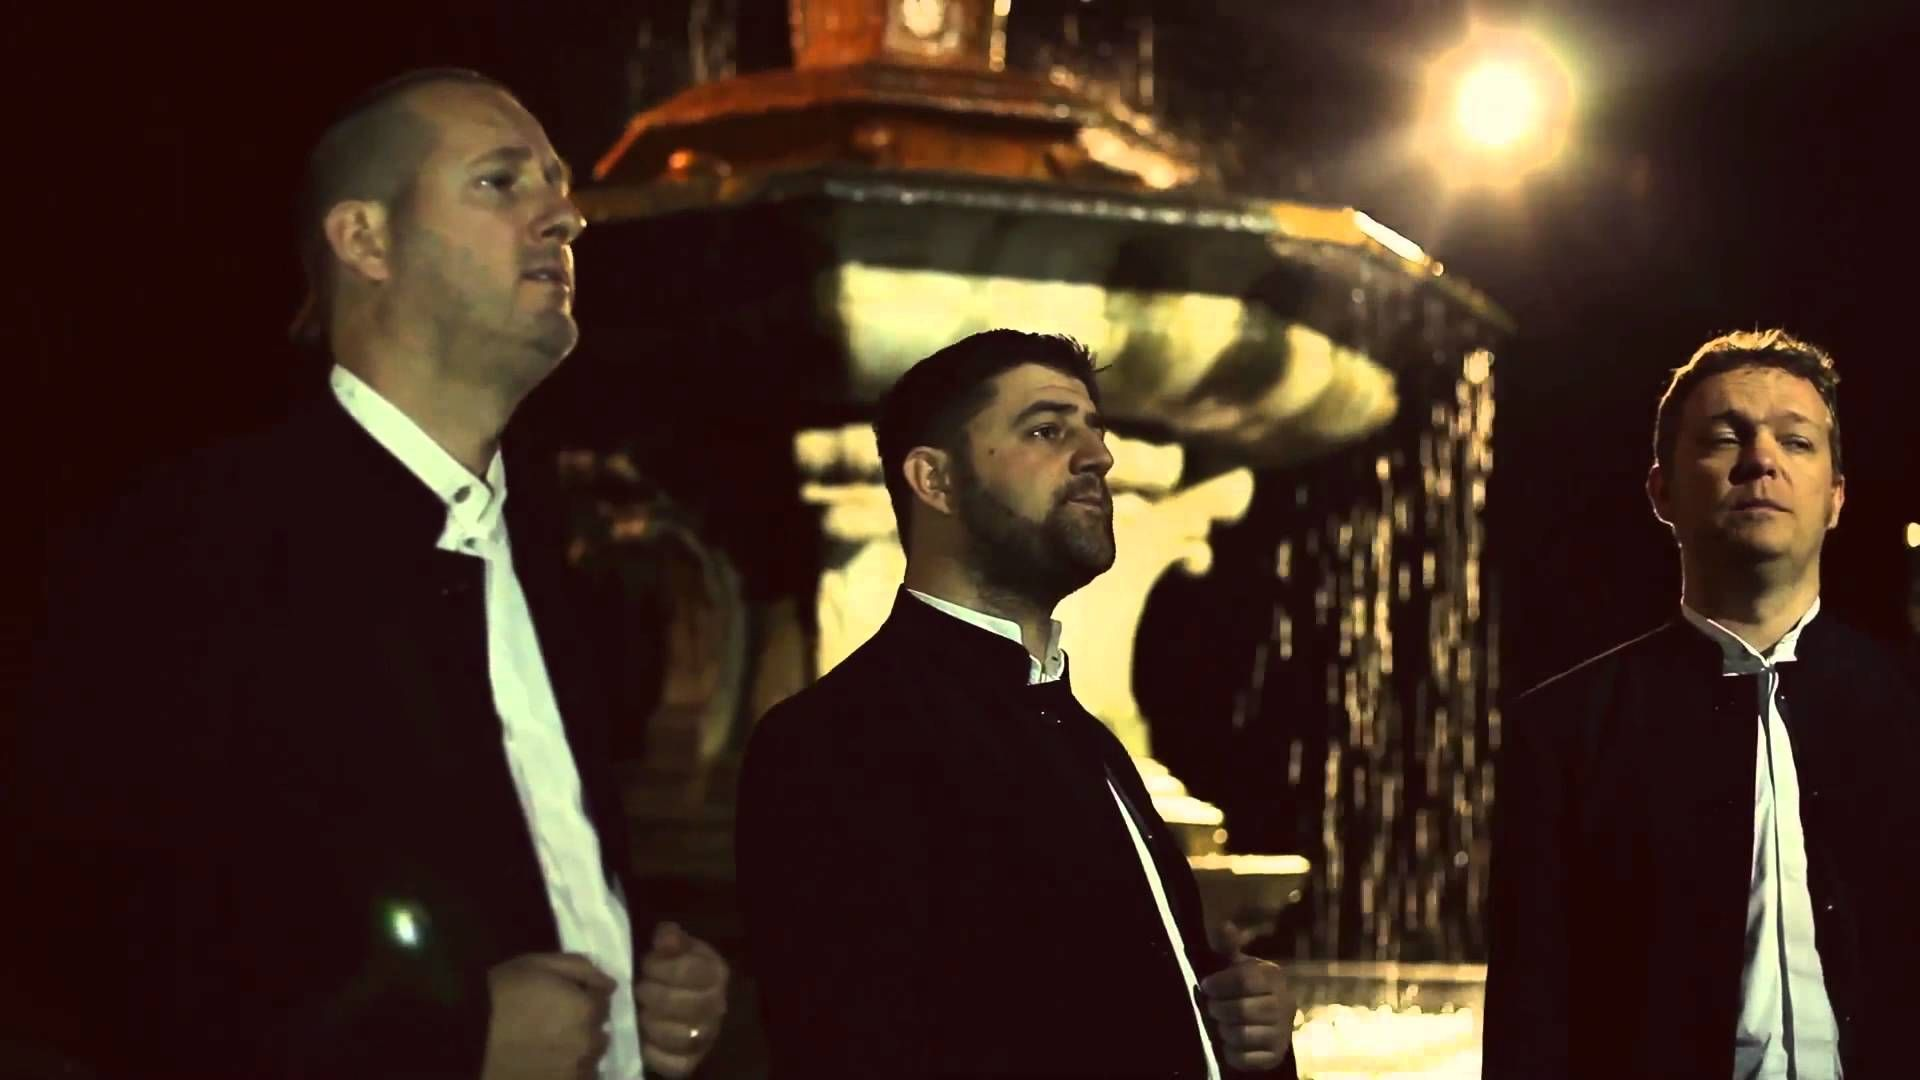 Klapa Cambi Mores Li Razumit Official Video Hd Music